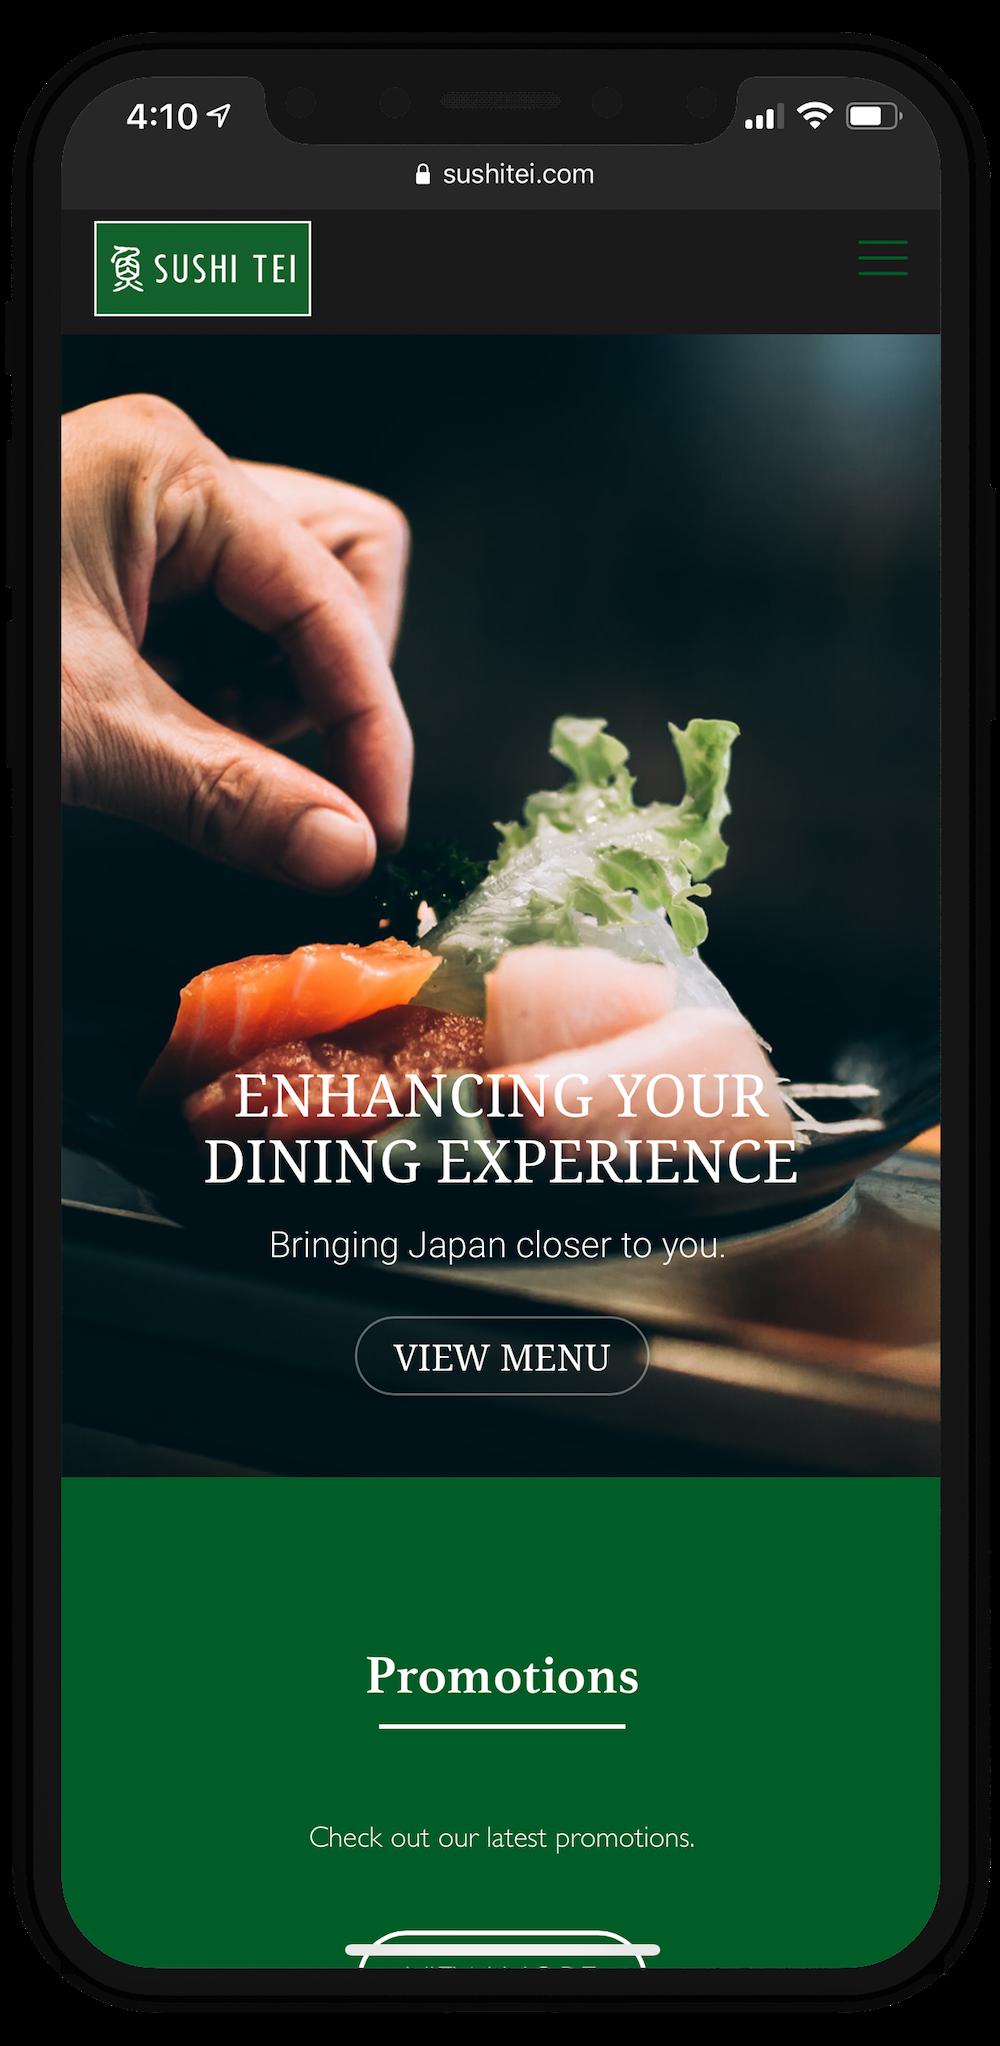 Sushi Tei Website